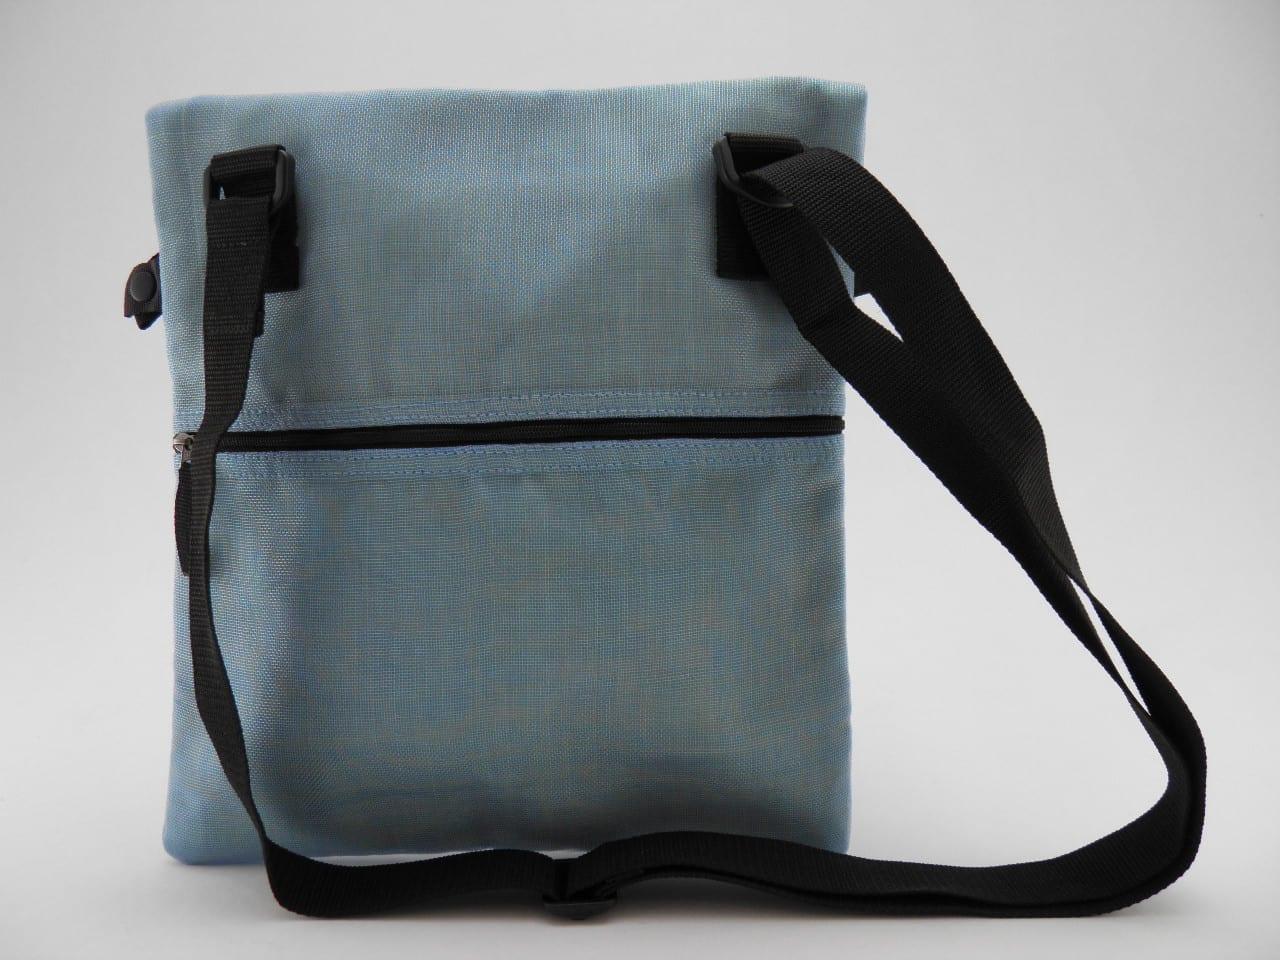 BIT - Square Ethical Bag - Light blue - verso